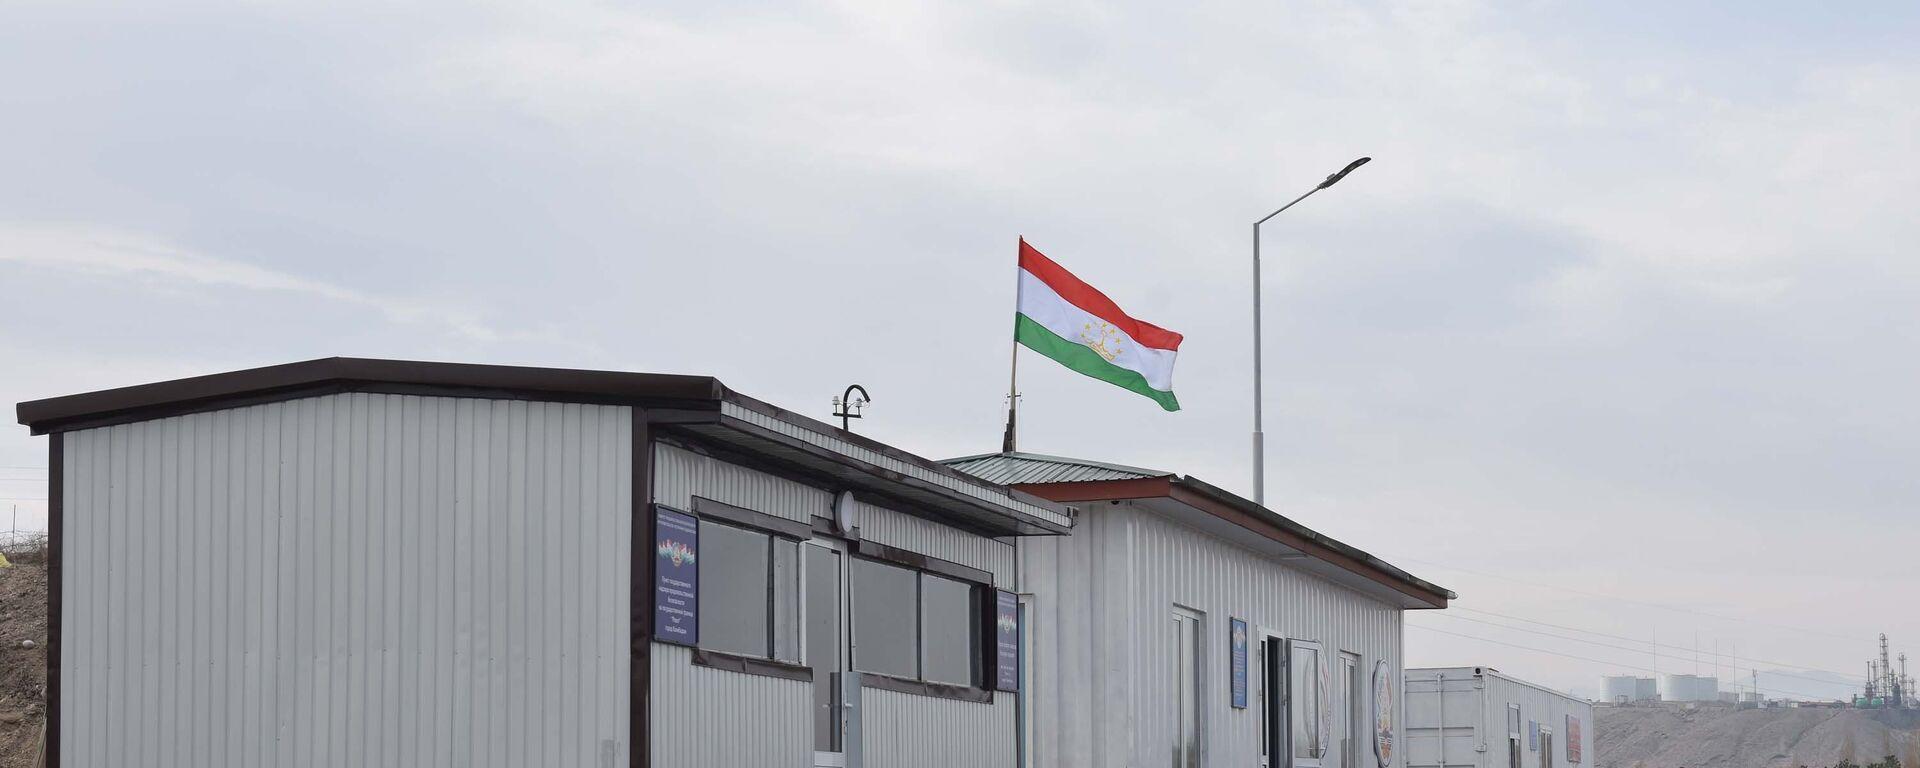 КПП Равот на границе Таджикистана и Узбекистана в городе Канибадам, архивное фото - Sputnik Таджикистан, 1920, 23.05.2021